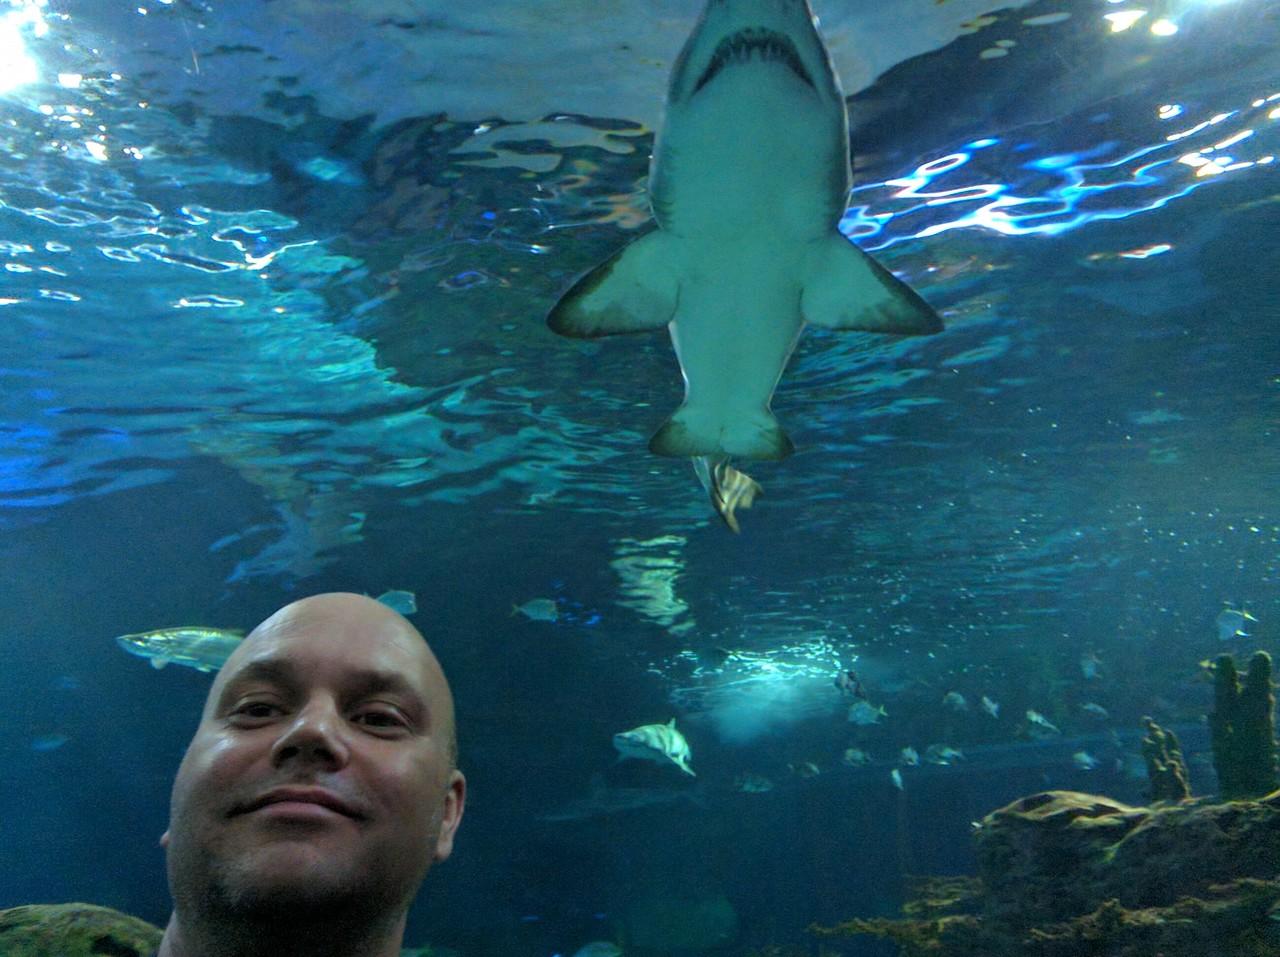 038 - Toronto - Aquarium - It's Right Behind Me, Isn't It